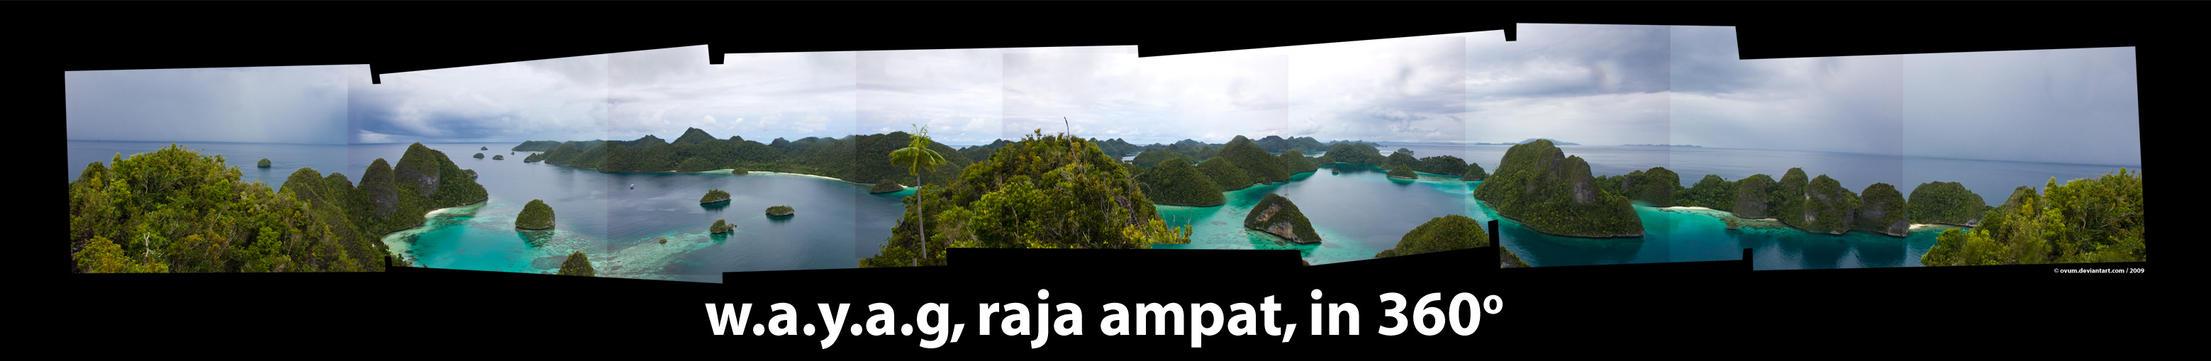 raja ampat - papua by ovum